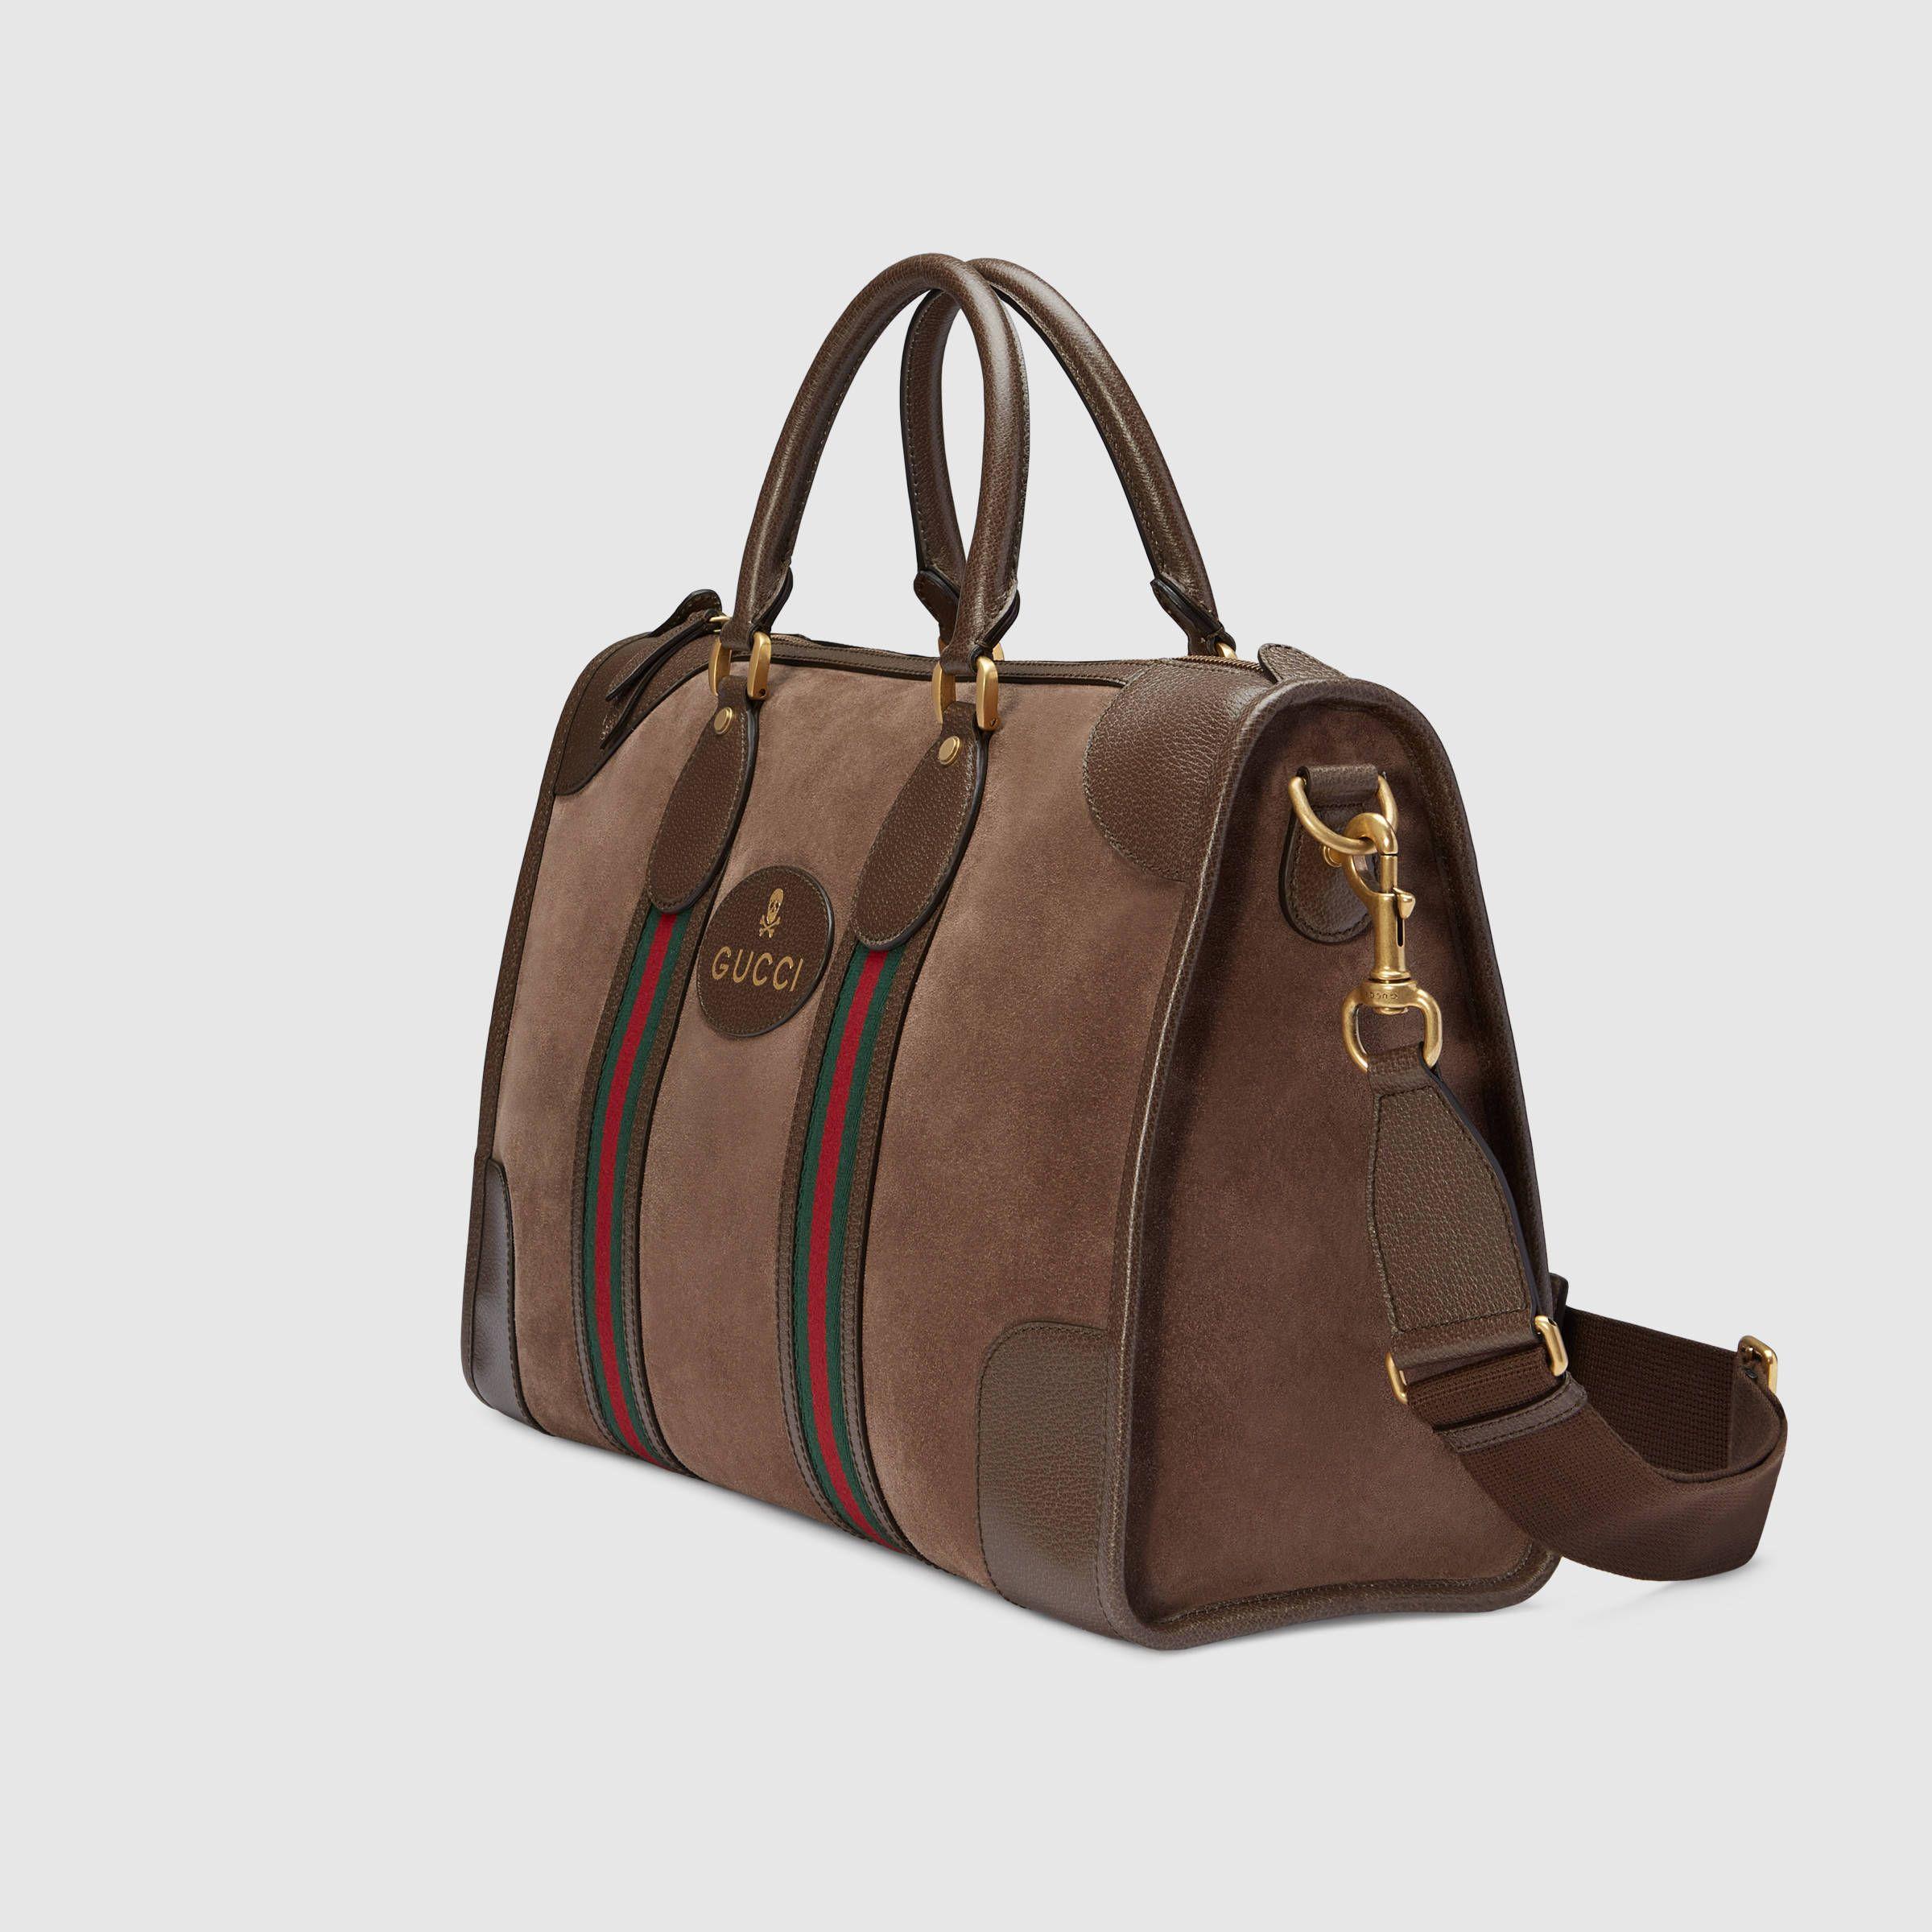 Gucci Monogram Mens Womens Travel Duffle Carryall Weekender Shoulder Tote Bag jZlY6fbg